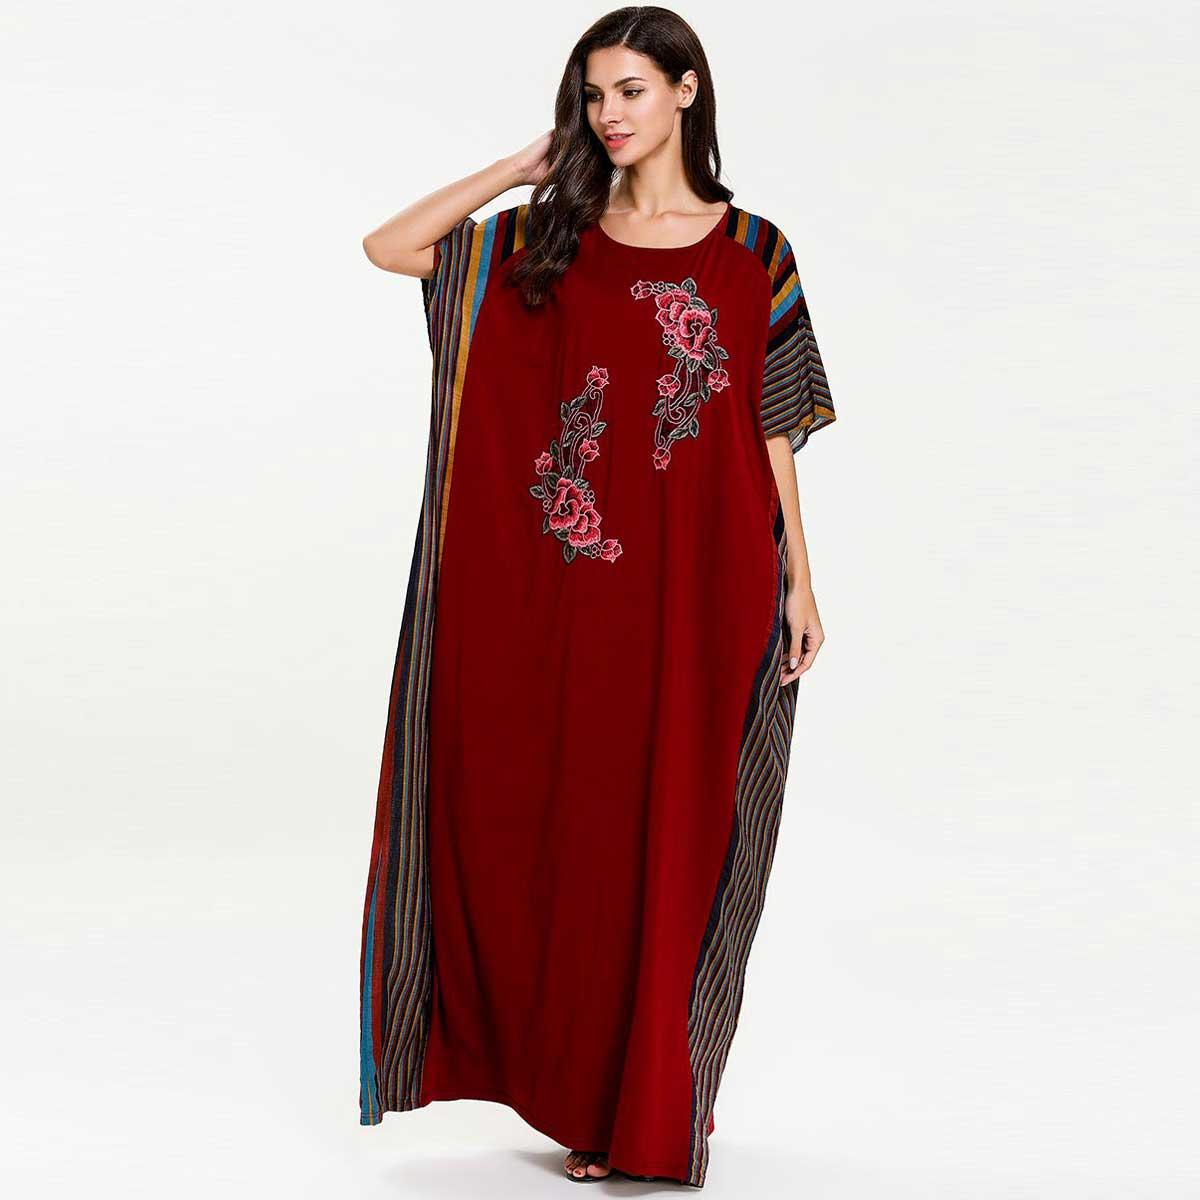 a99cf7267b02d 2019 Summer Batwing Sleeve Women Floral Embroidery Muslim Dress Colored  Stripe Patchwork Islamic Abaya Dubai Arab Gown VKDR1617